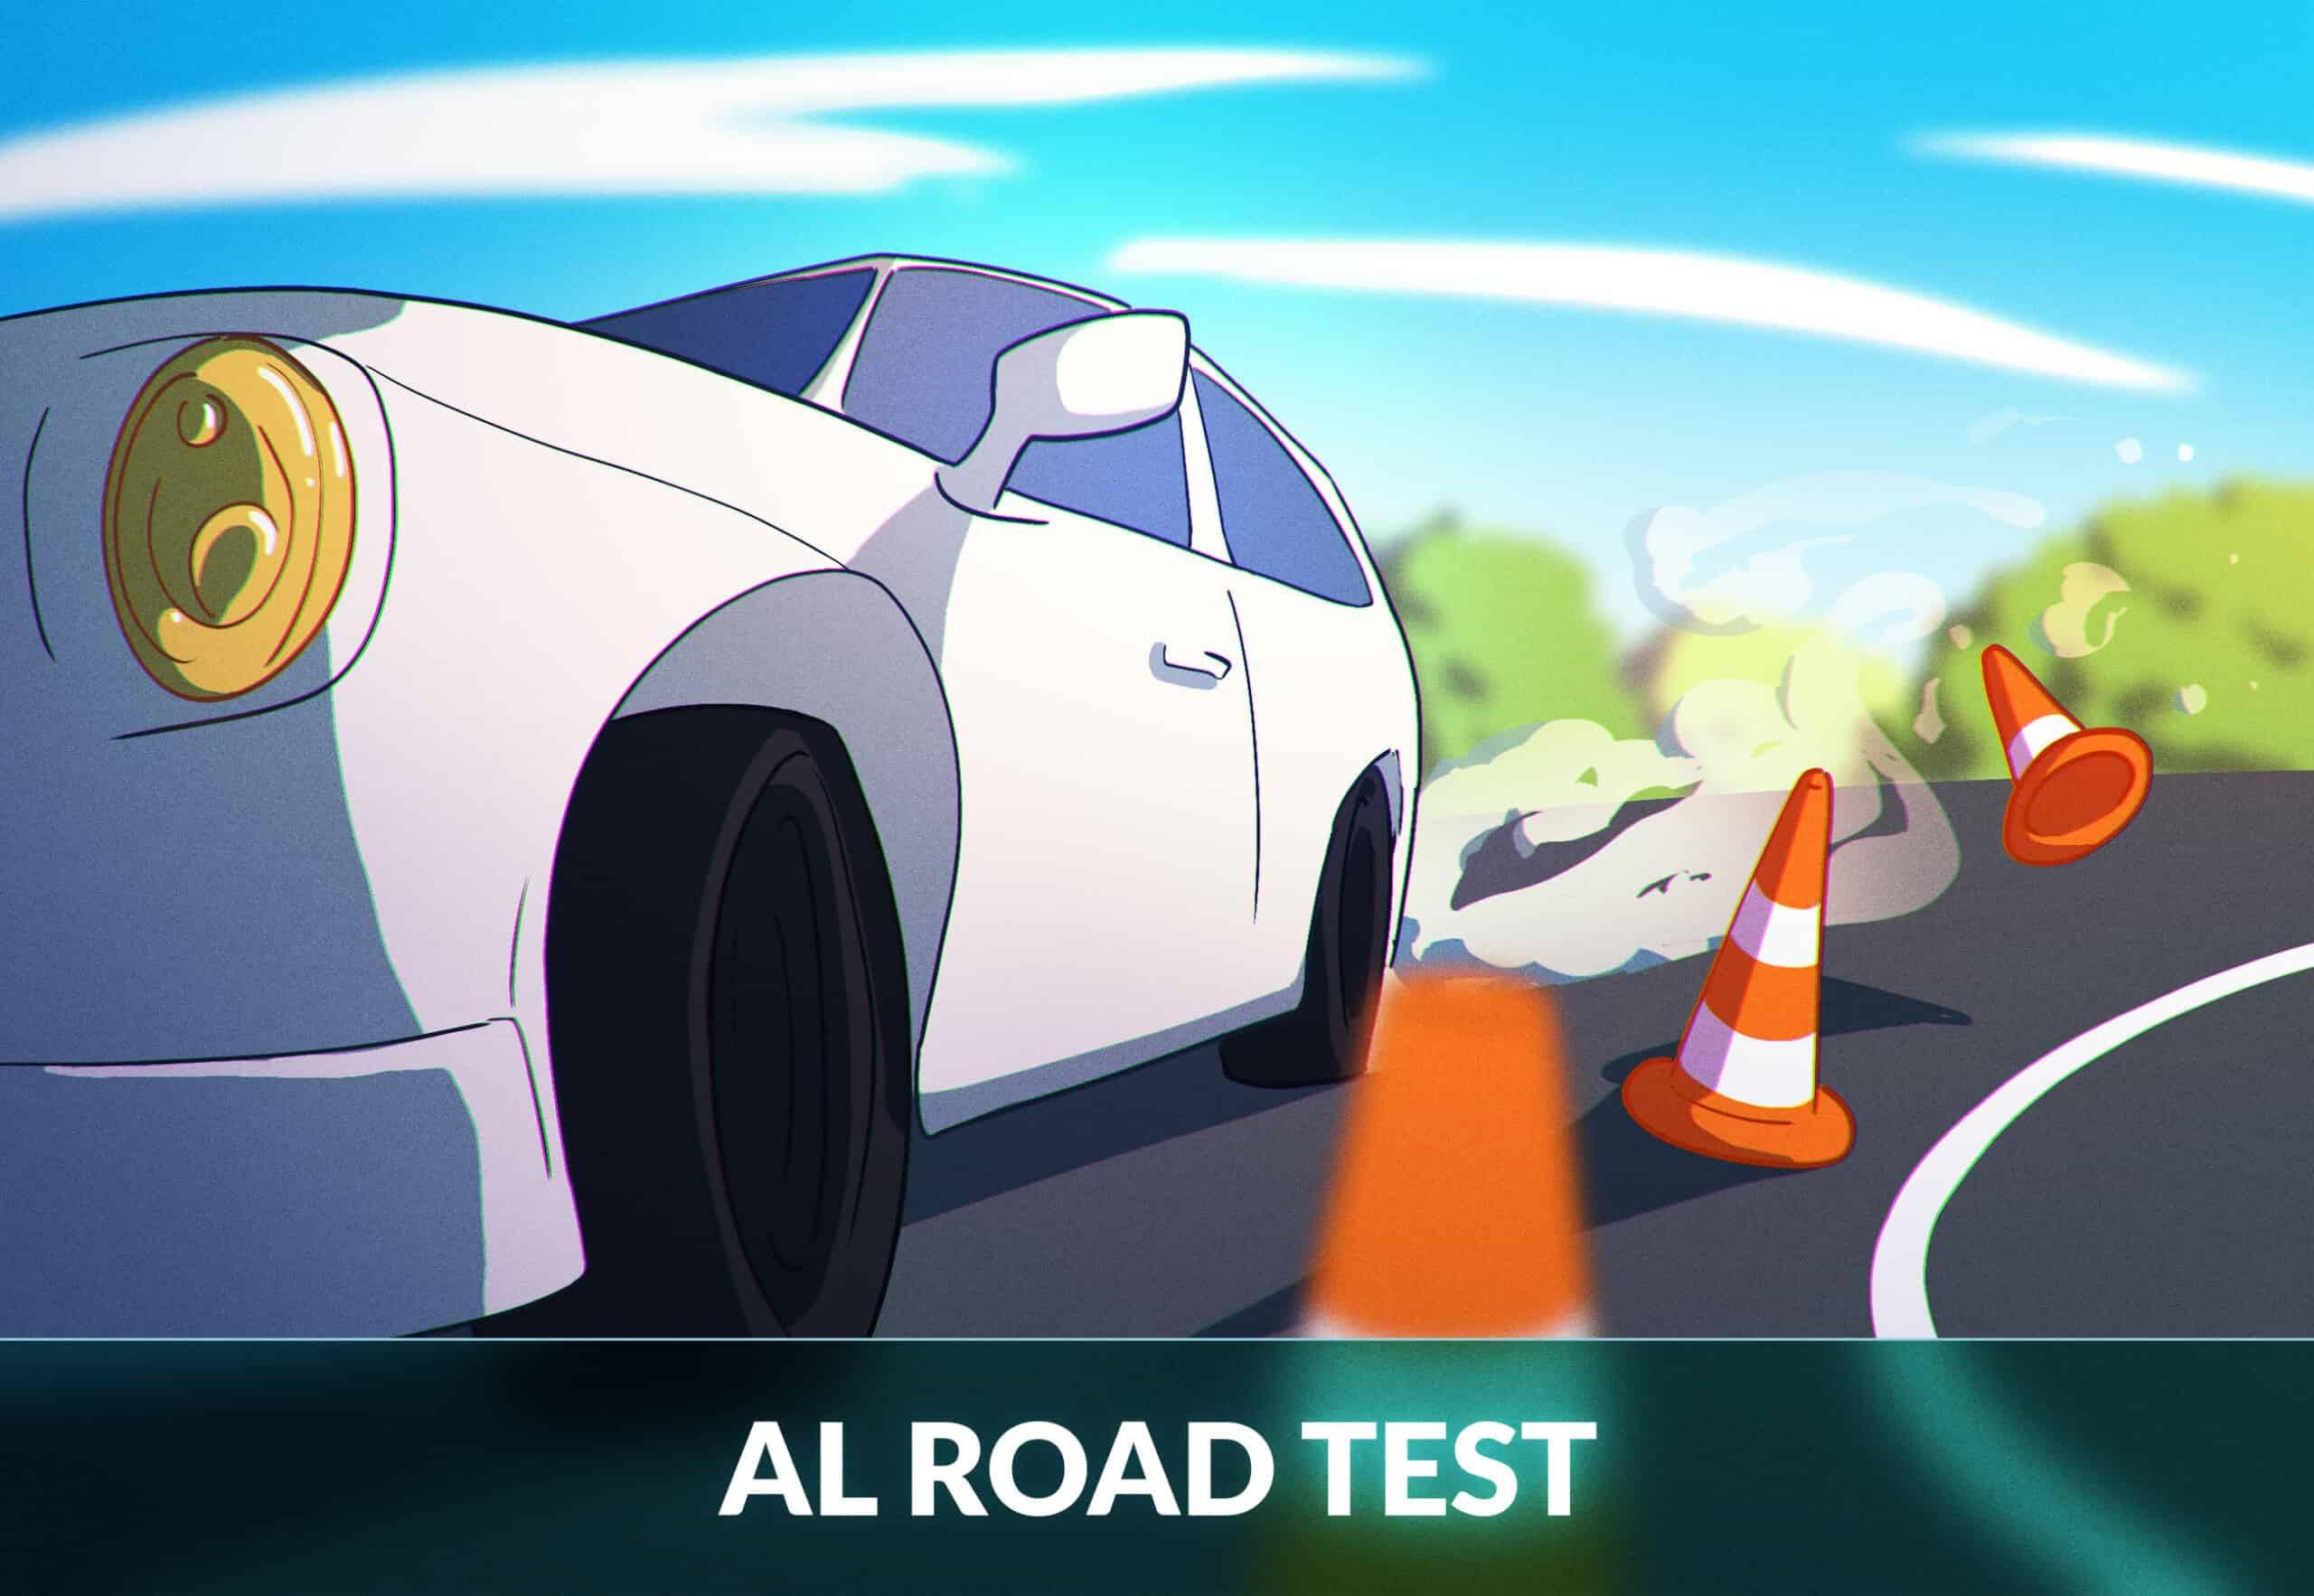 Alabama road test